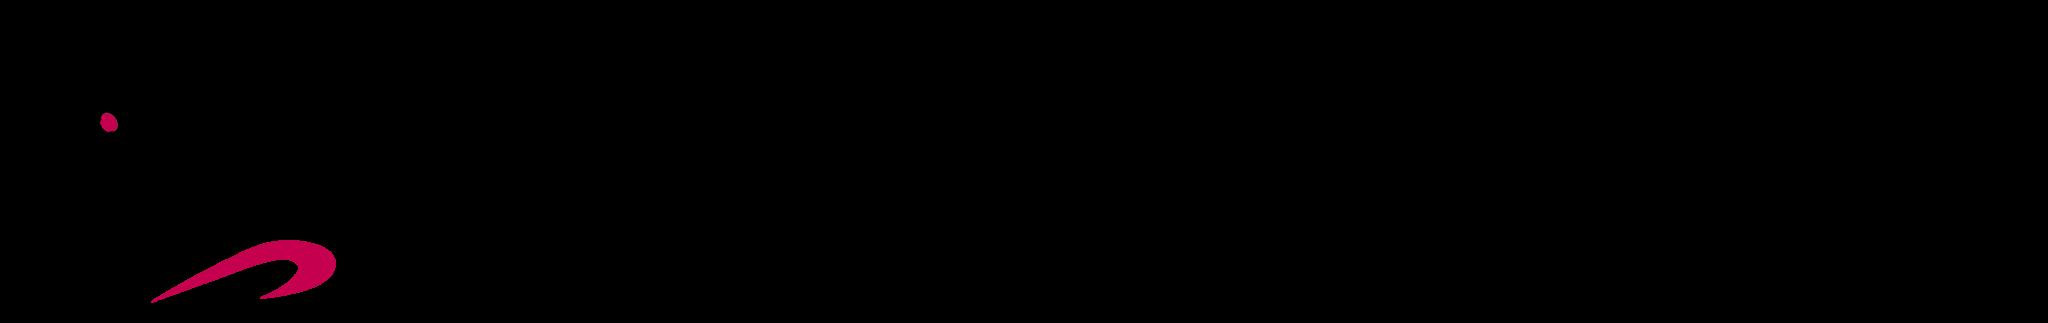 MIHO BALLET ARTSロゴマーク